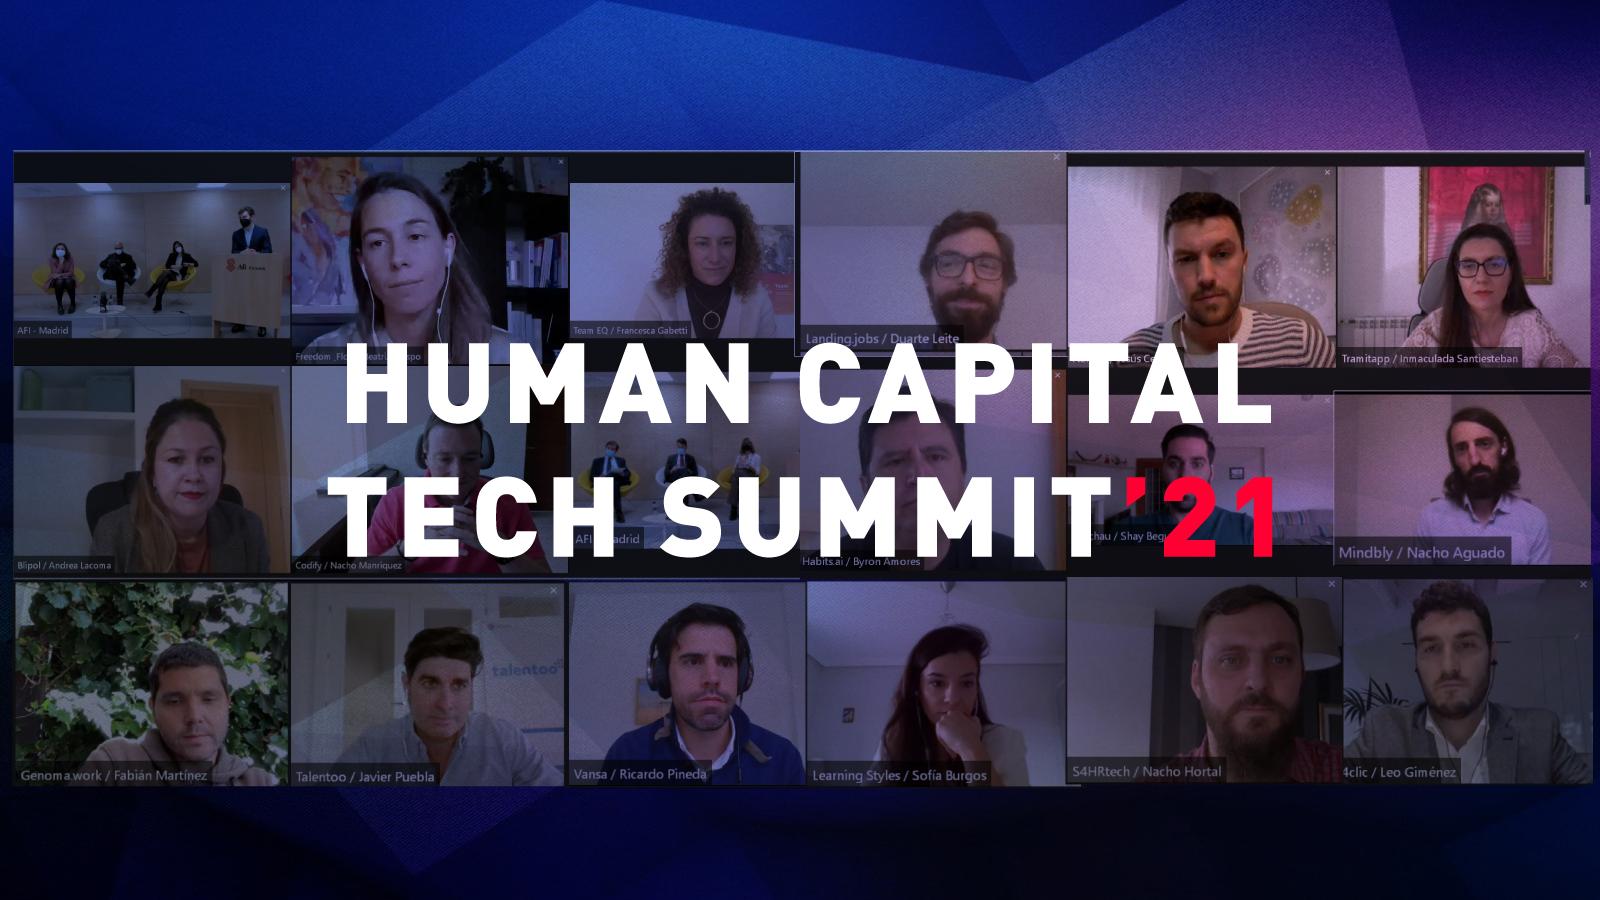 Human capital tech summit